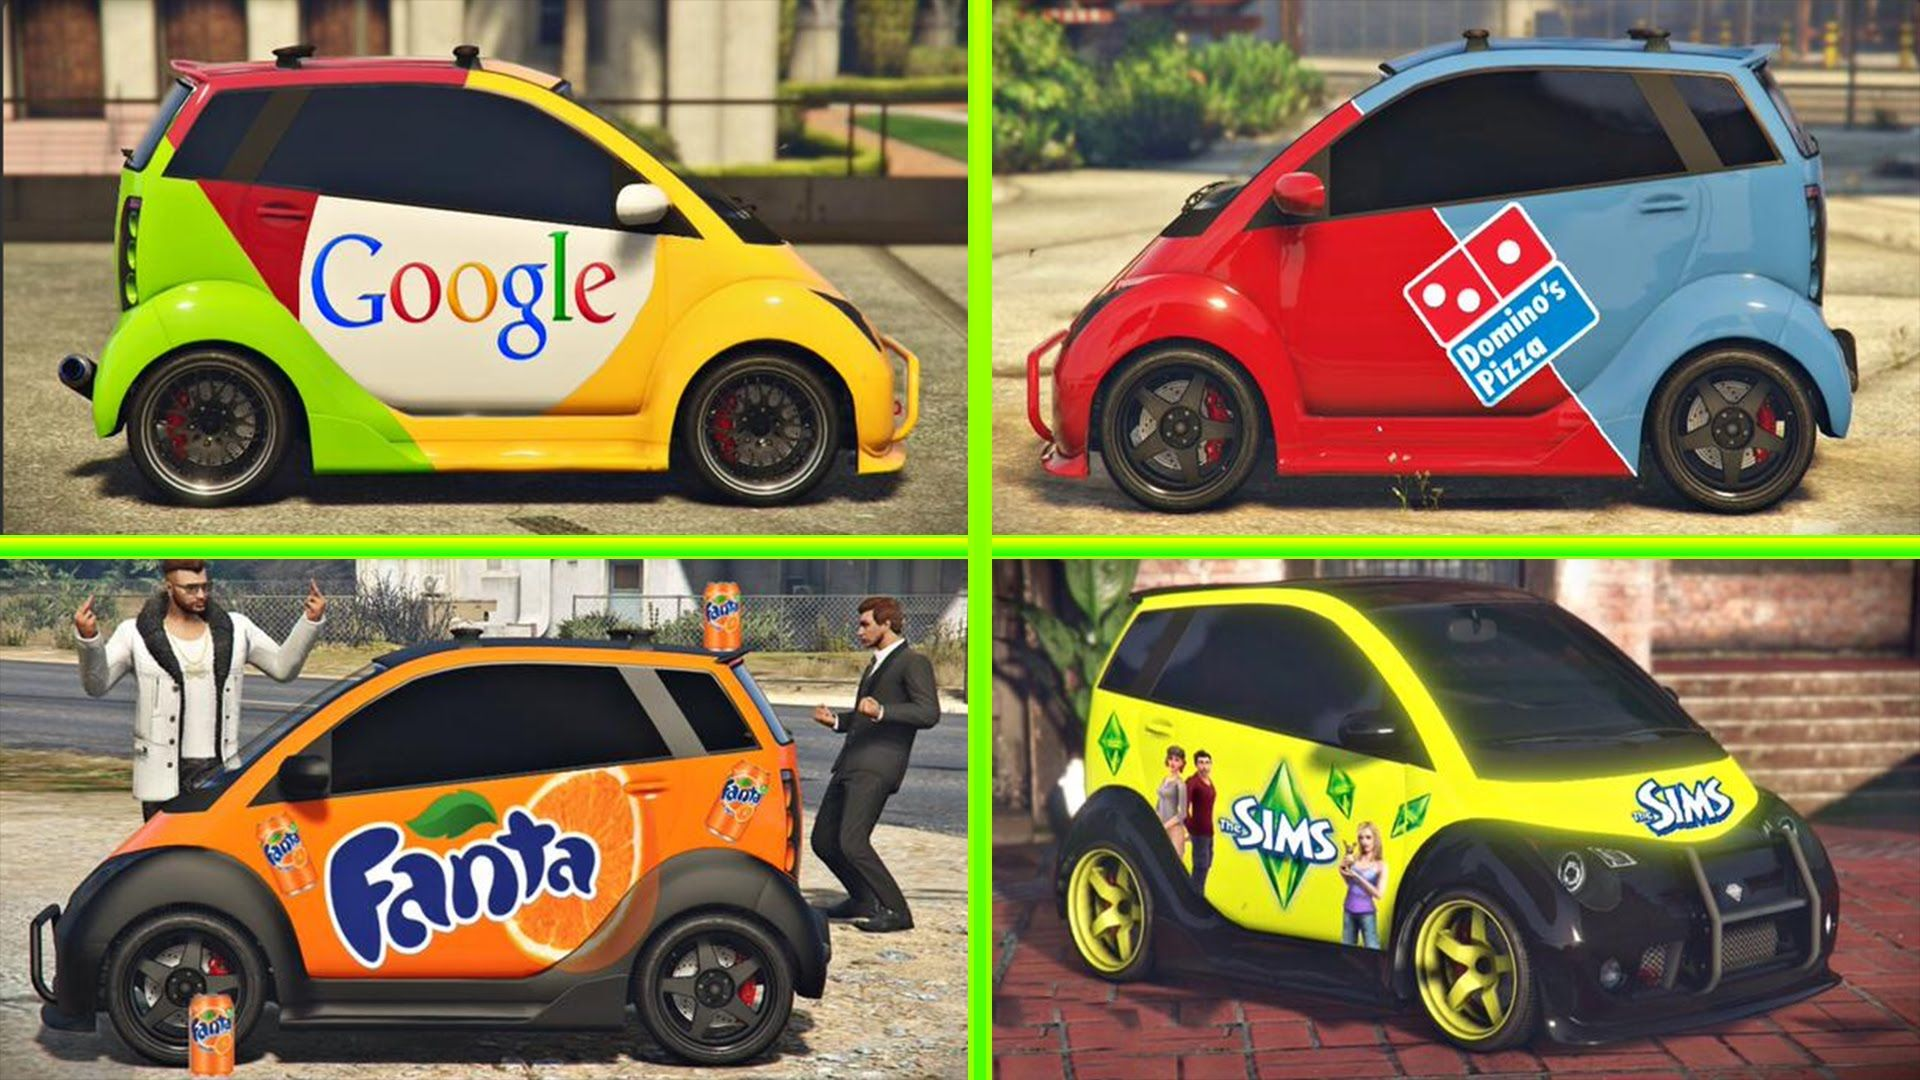 Gta 5 Custom Cars >> Gta 5 Rare Custom Cars In Gta 5 Online Insane Vehicle Skins Gta